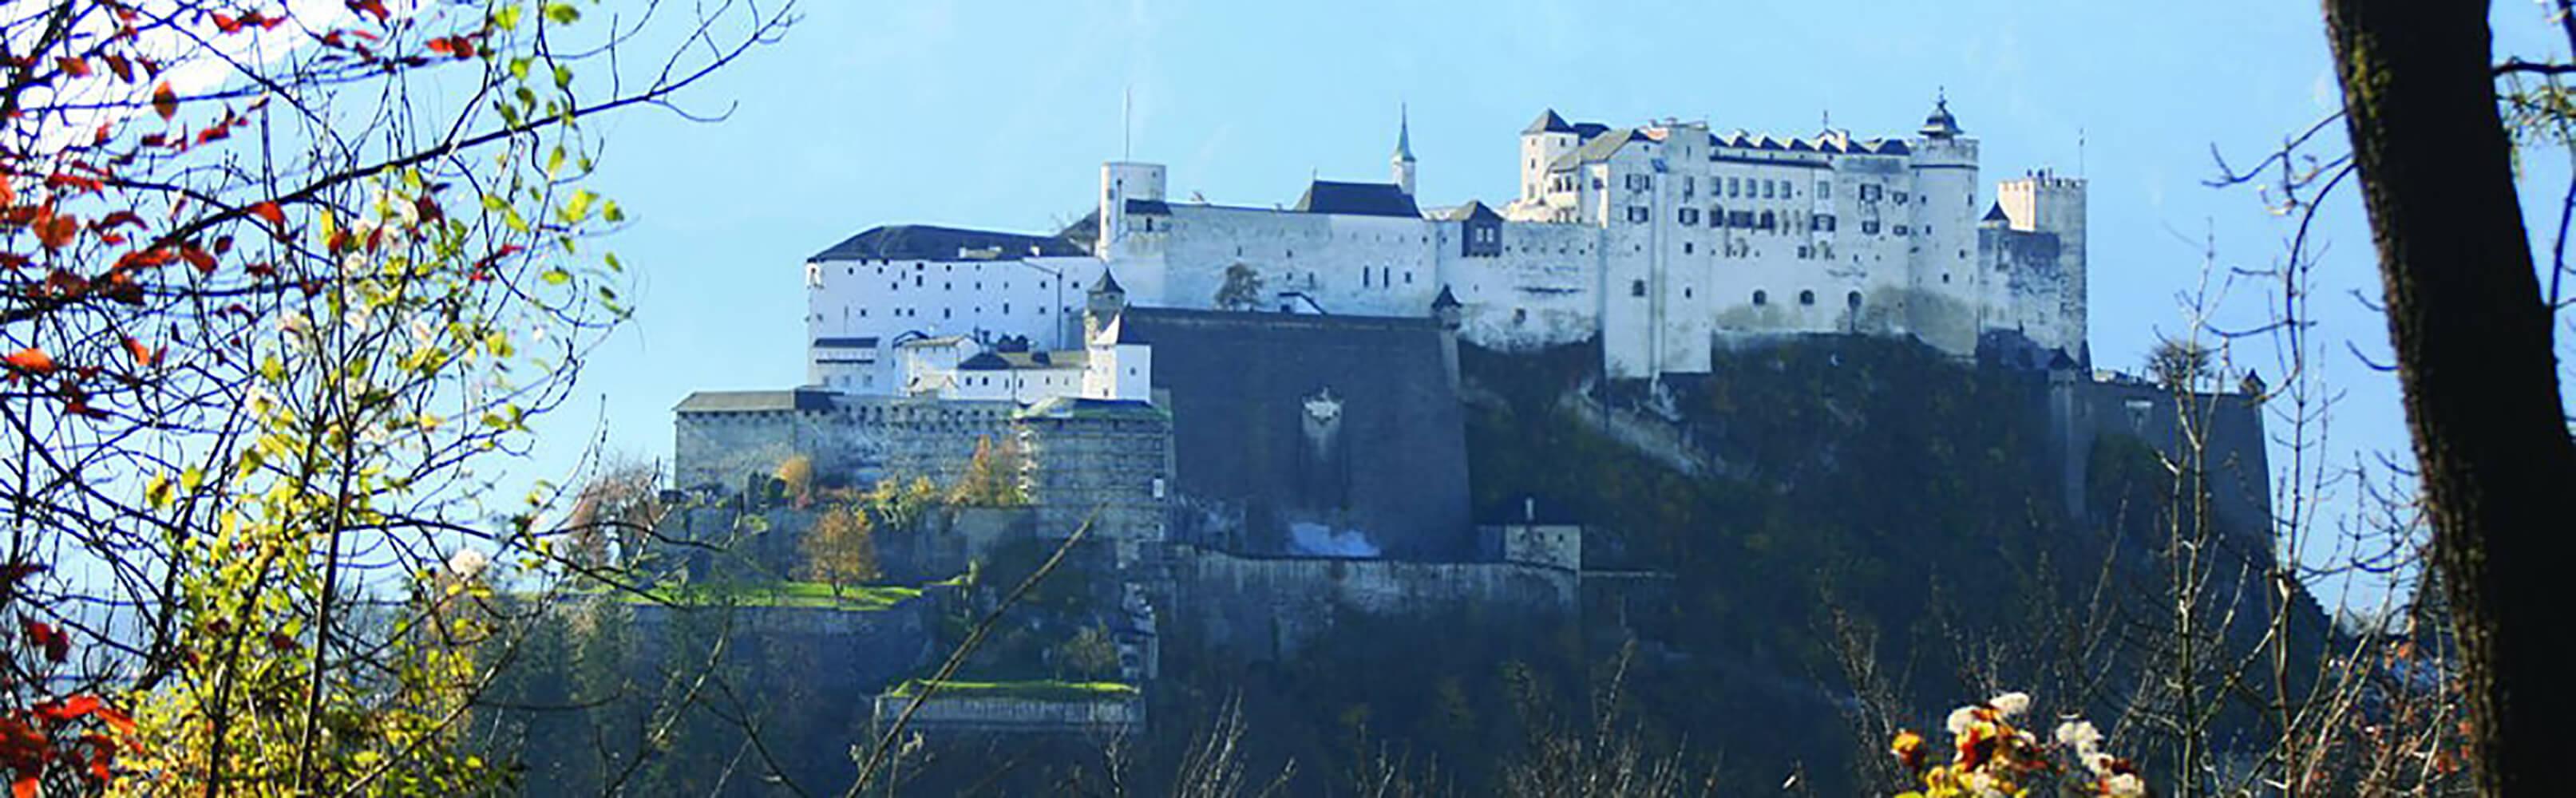 Festung Hohensalzburg 1